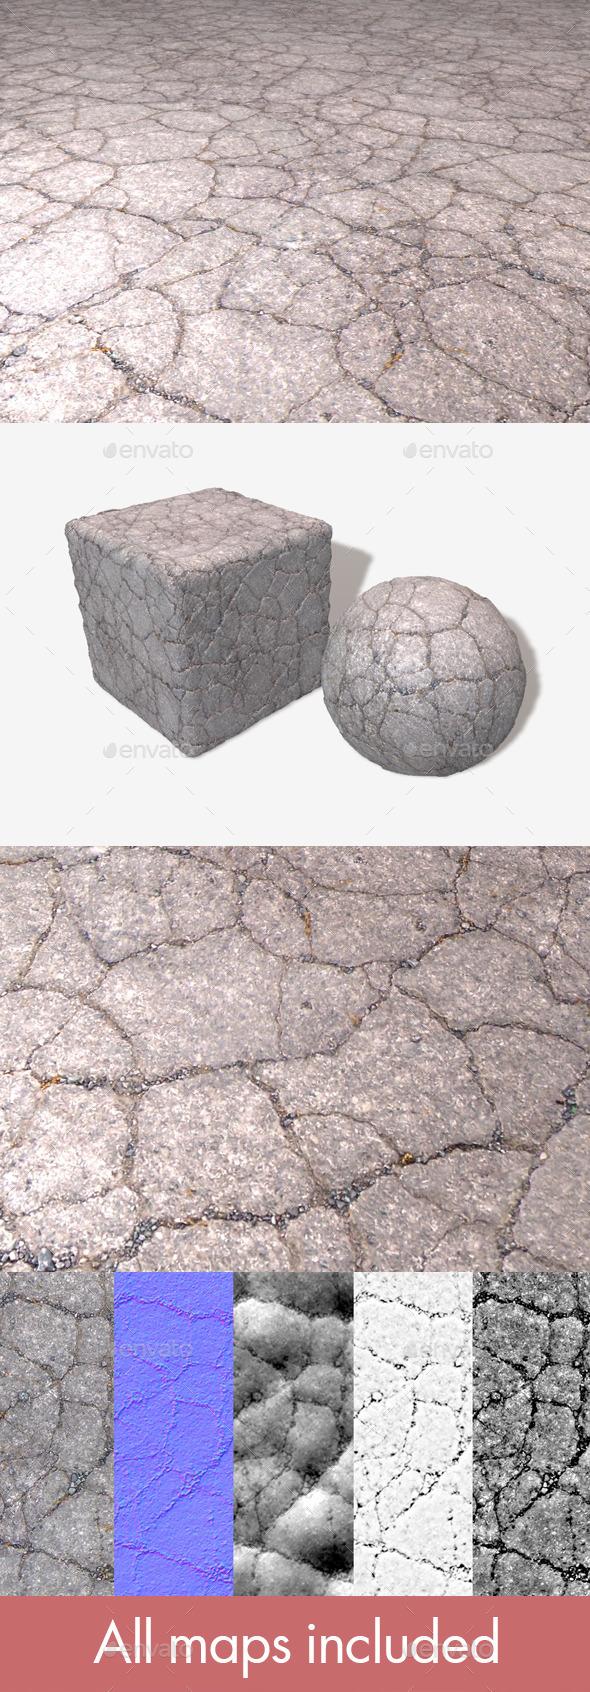 3DOcean Cracked Tarmac Seamless Texture 11589185